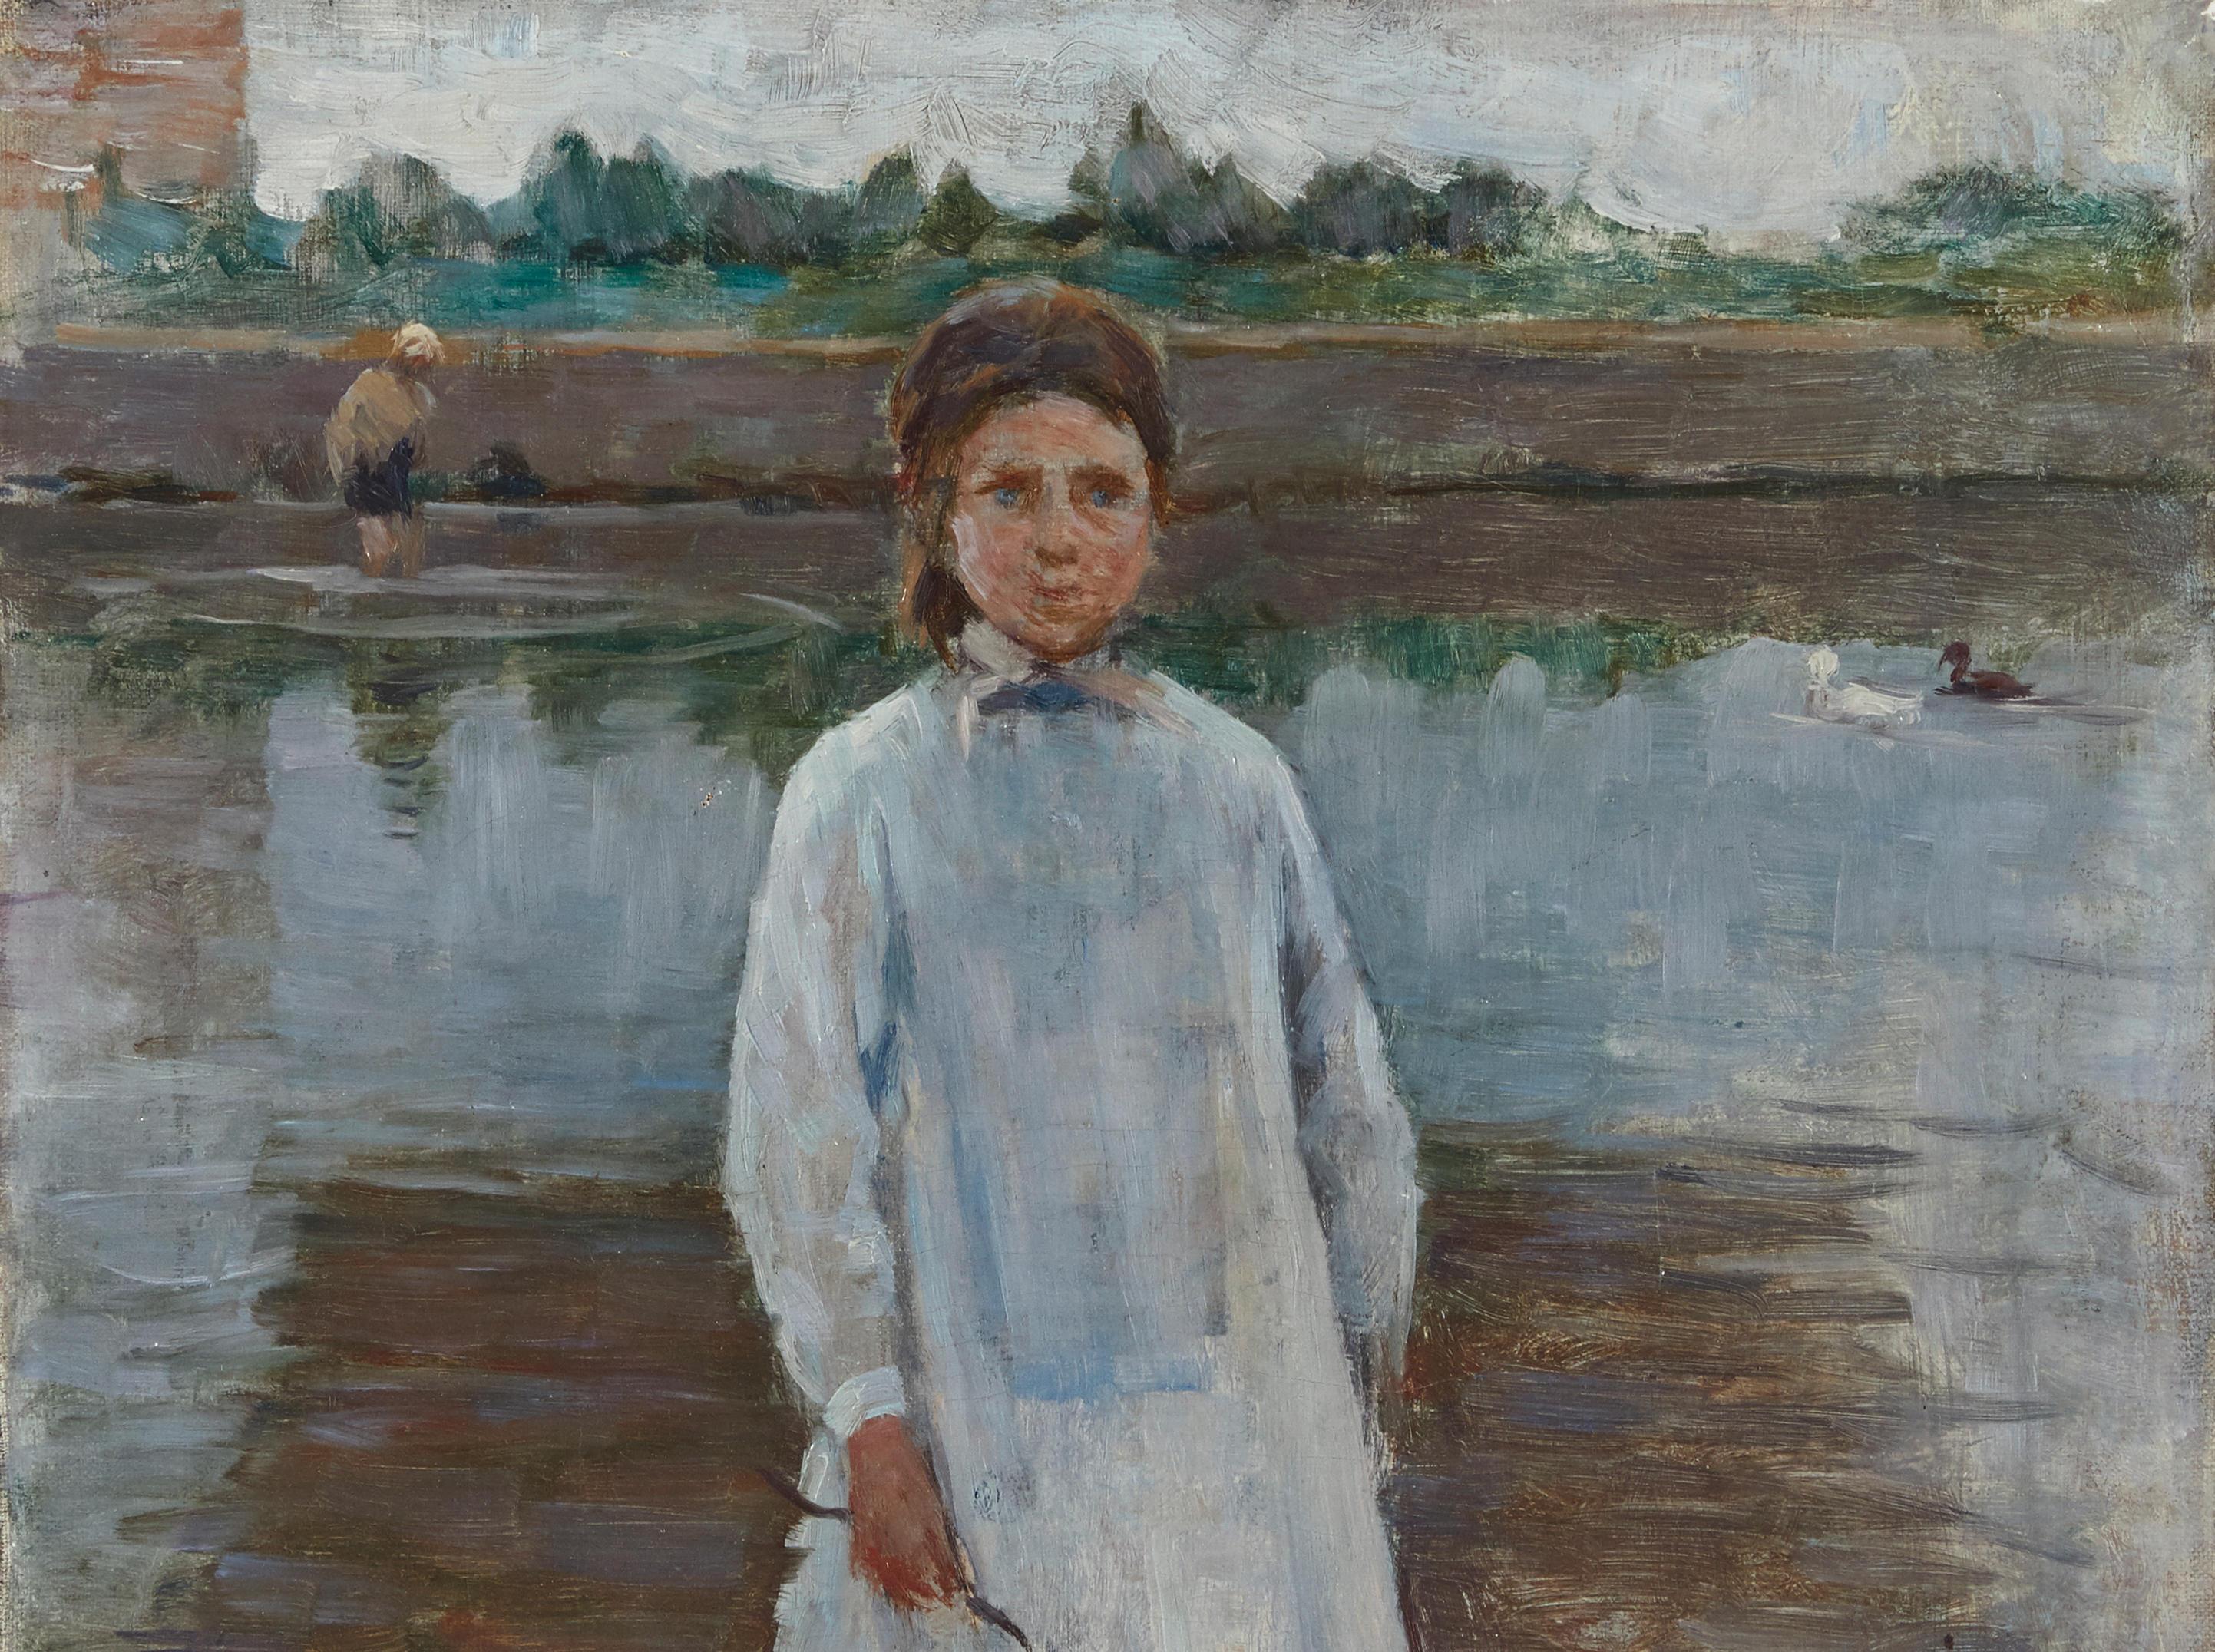 HENRI LE SIDANER (1862-1939) Fillette à l'abreuvoir 18 x 12 7/8 in (45.7 x 32.7 cm) (Painted in Saint-Valéry-sur-Somme in Spring 1890)